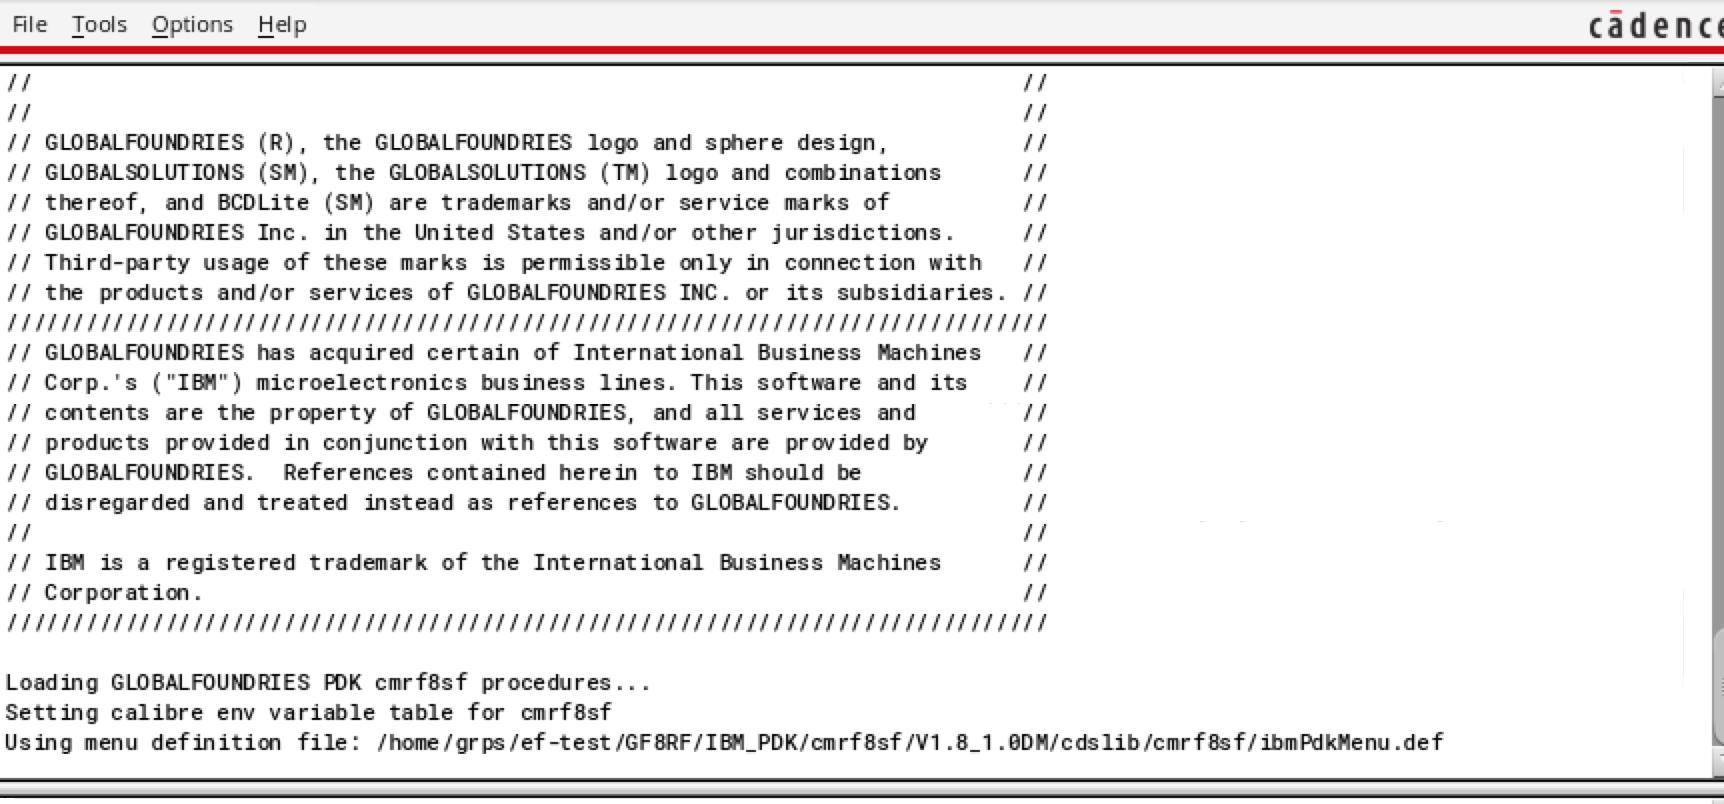 PDK menu not showing in CIW - Custom IC Design - Cadence